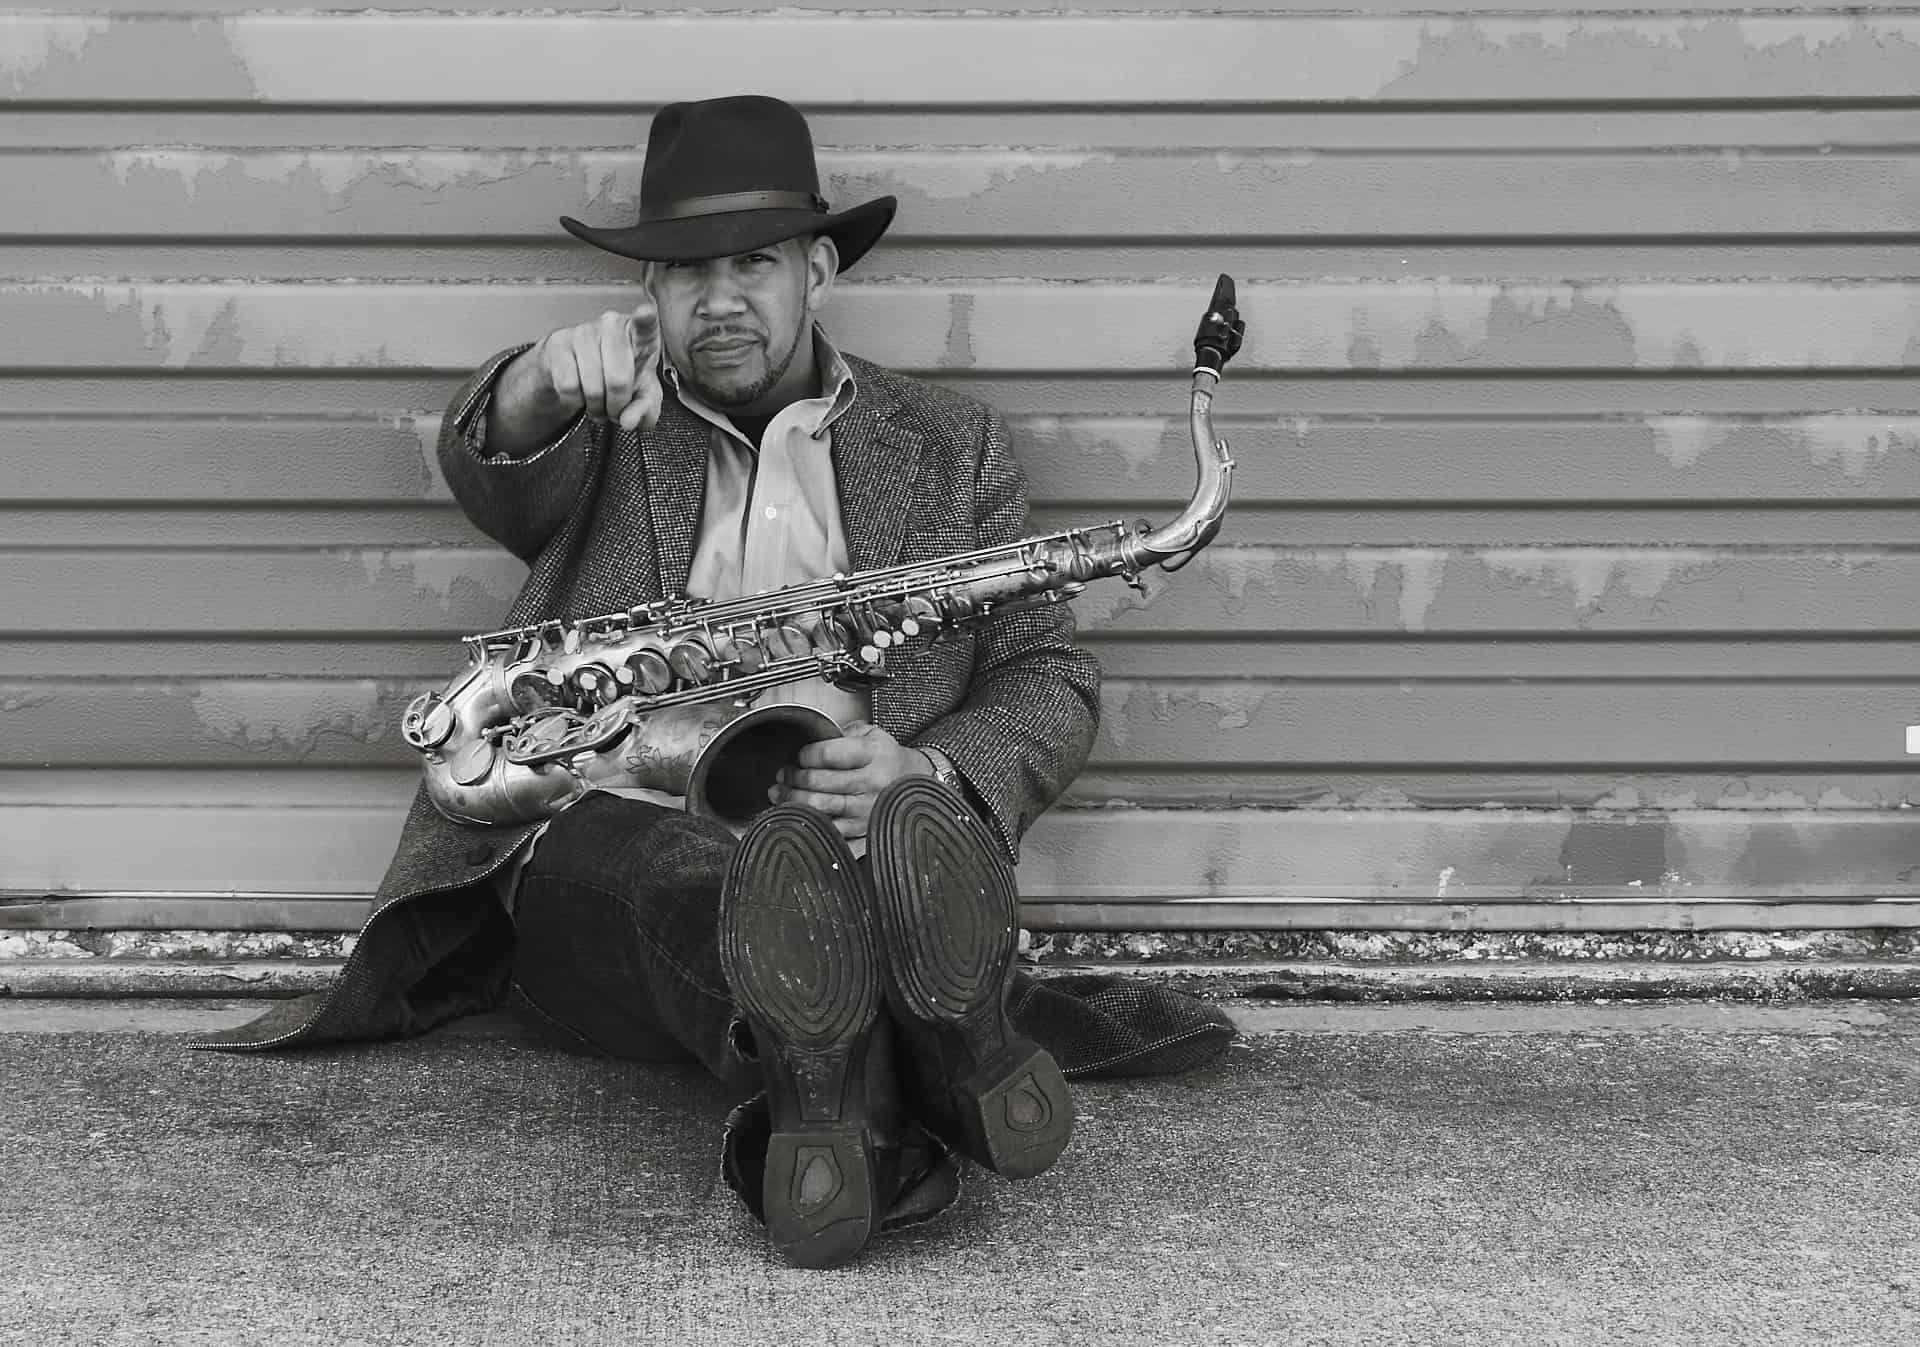 Saxophone player sitting on ground